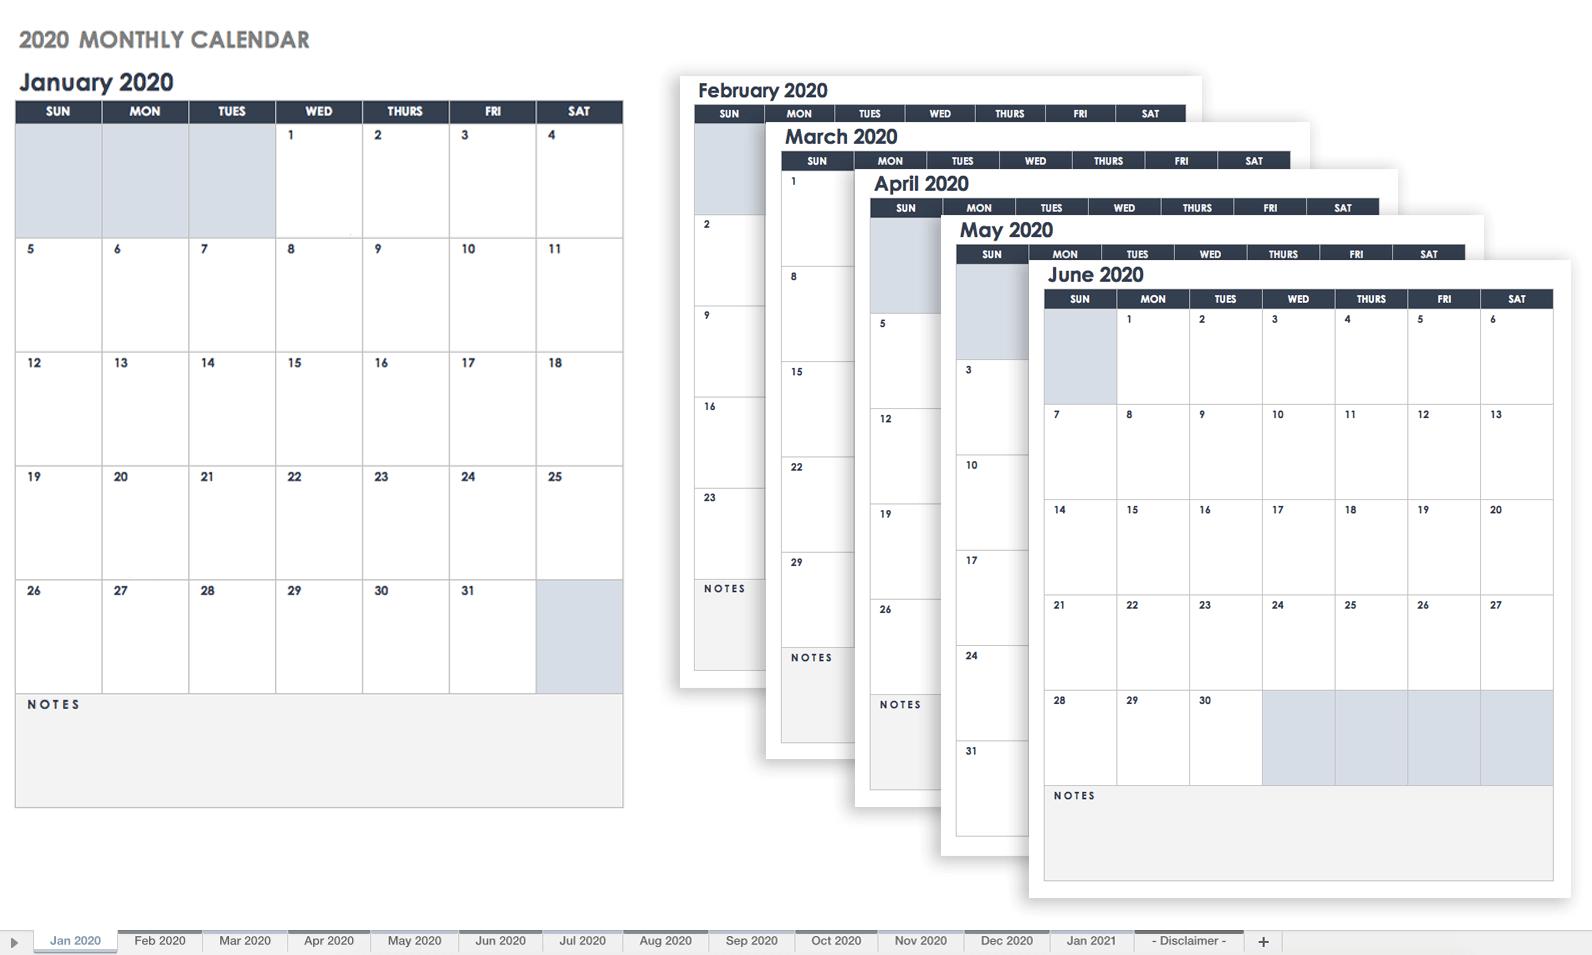 Free Google Calendar Templates | Smartsheet in Portriat Style Free Printable Calendar 2019-2020